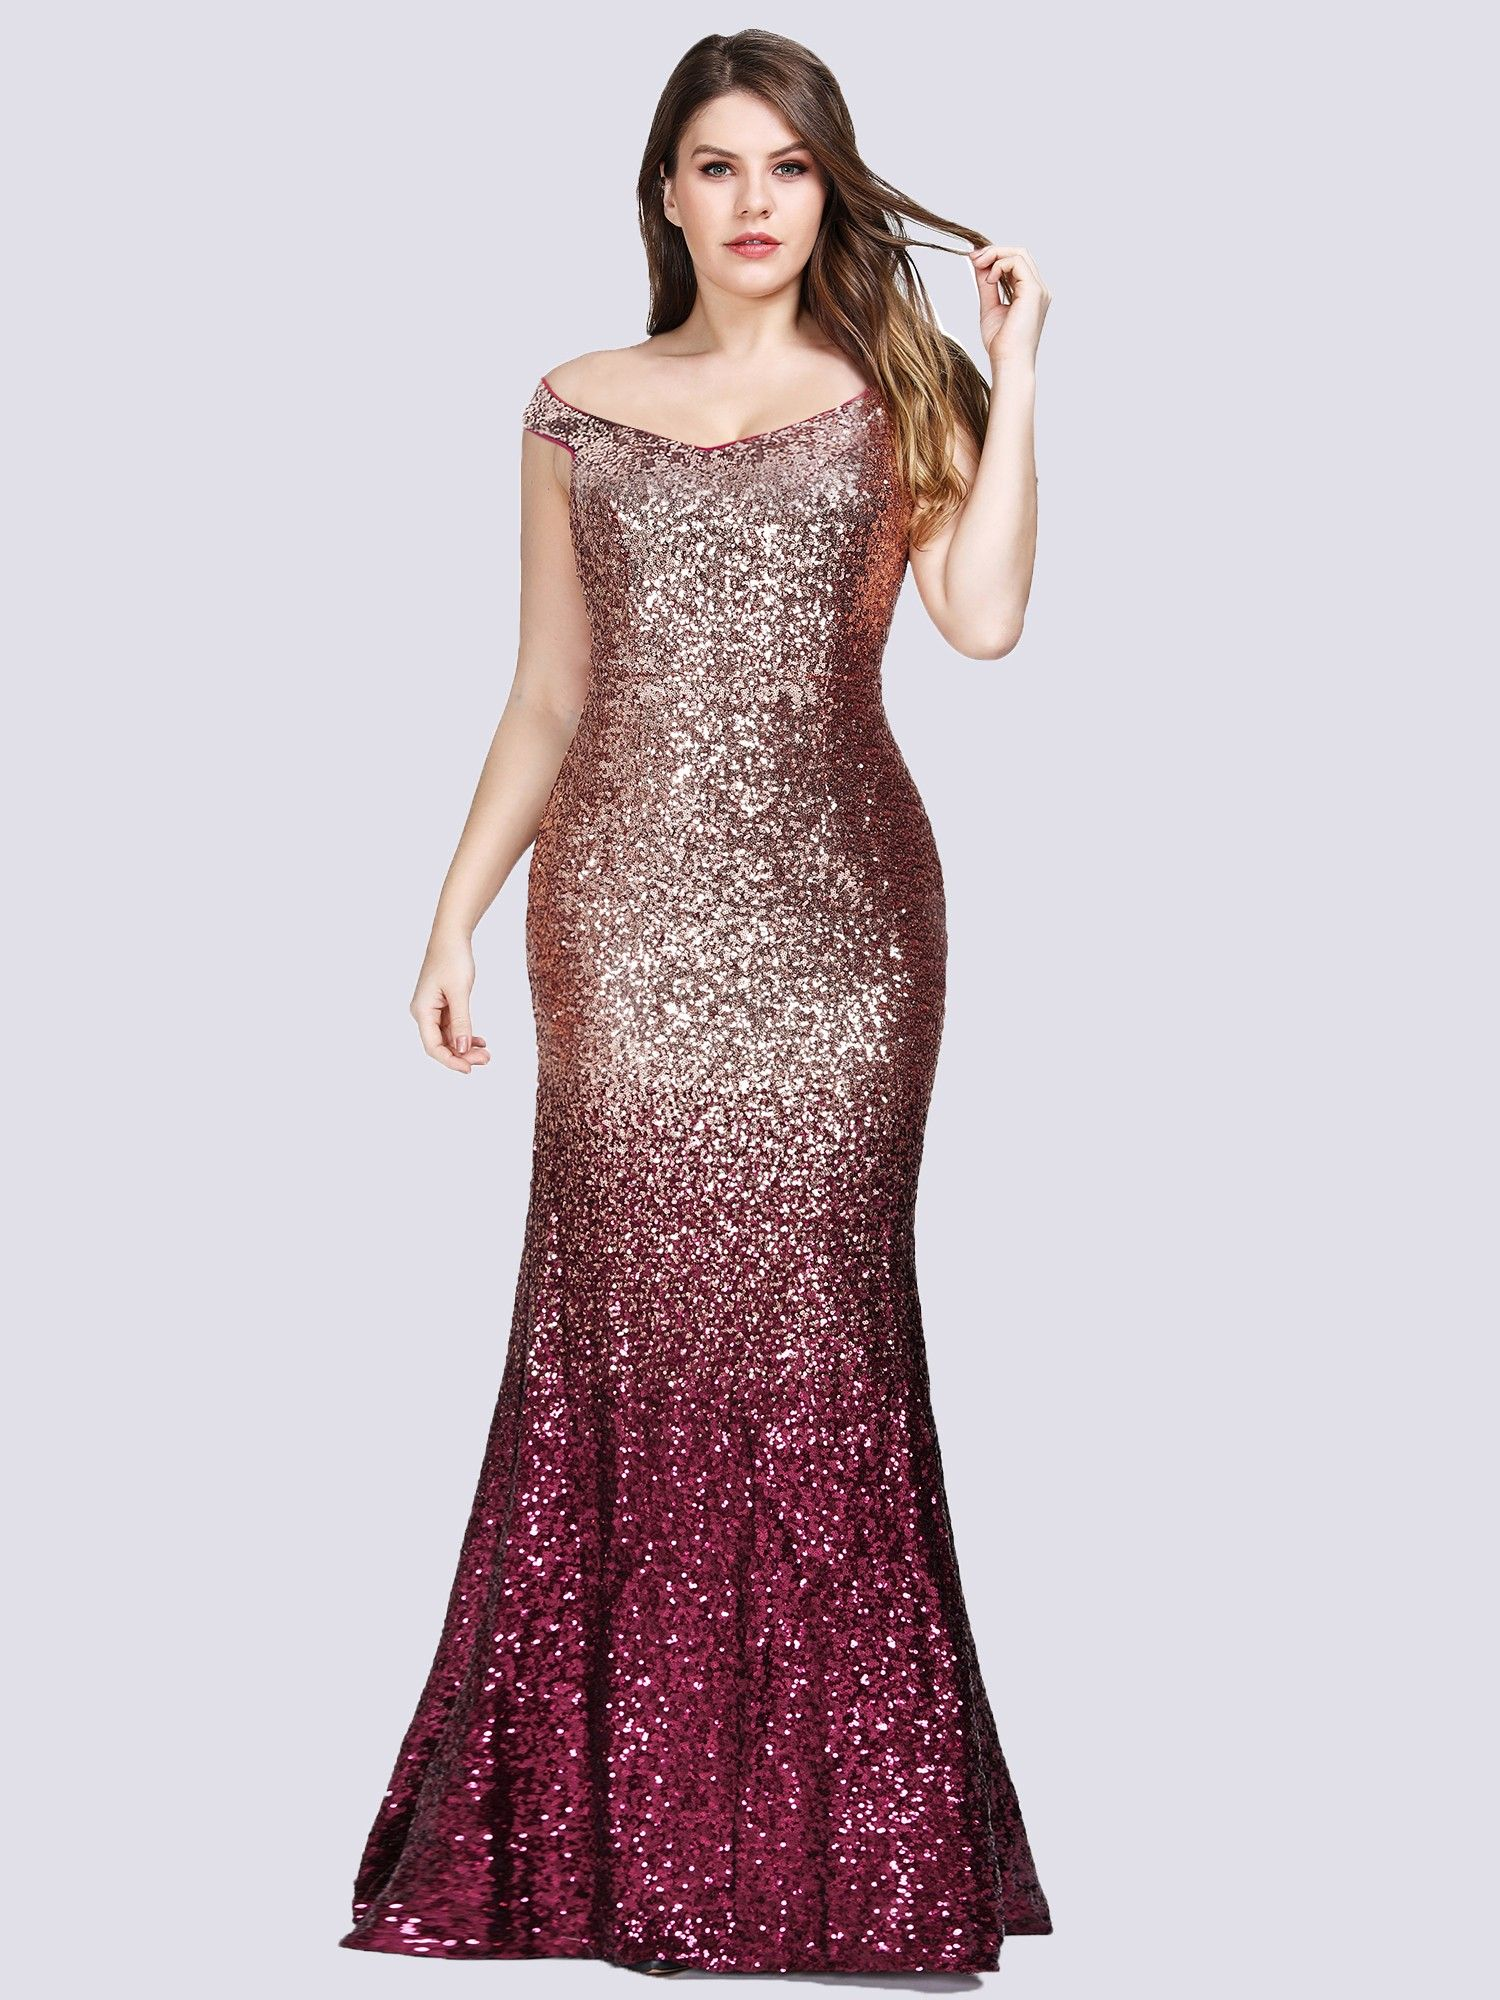 c58dc5573a Plus Size Off Shoulder Floor Length Sequins Evening Gown  sequindress   mermaiddress  ombredress  eveningdress  promdress  EverPretty